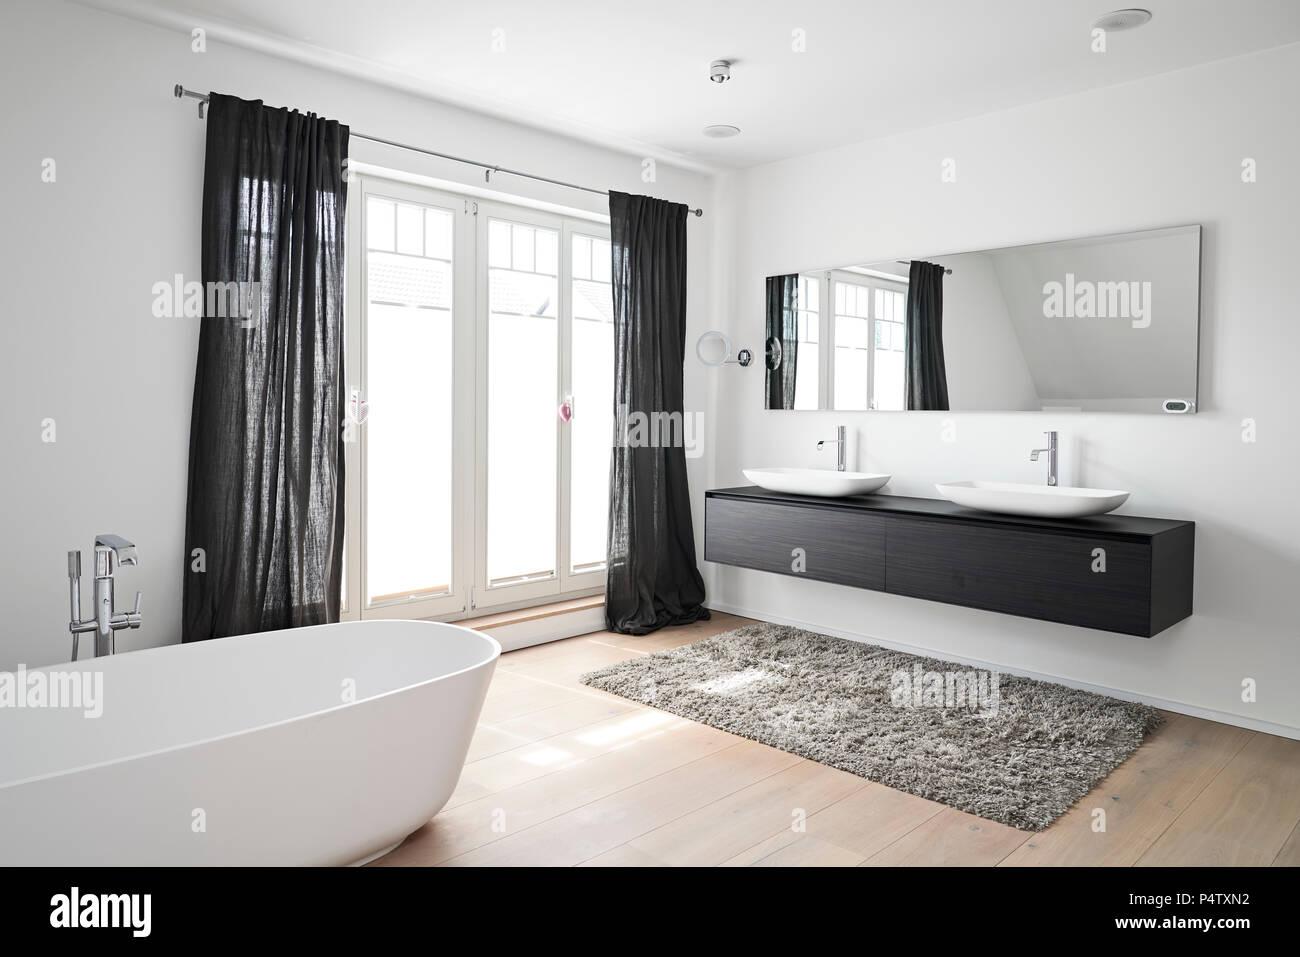 Spacious modern bathroom - Stock Image